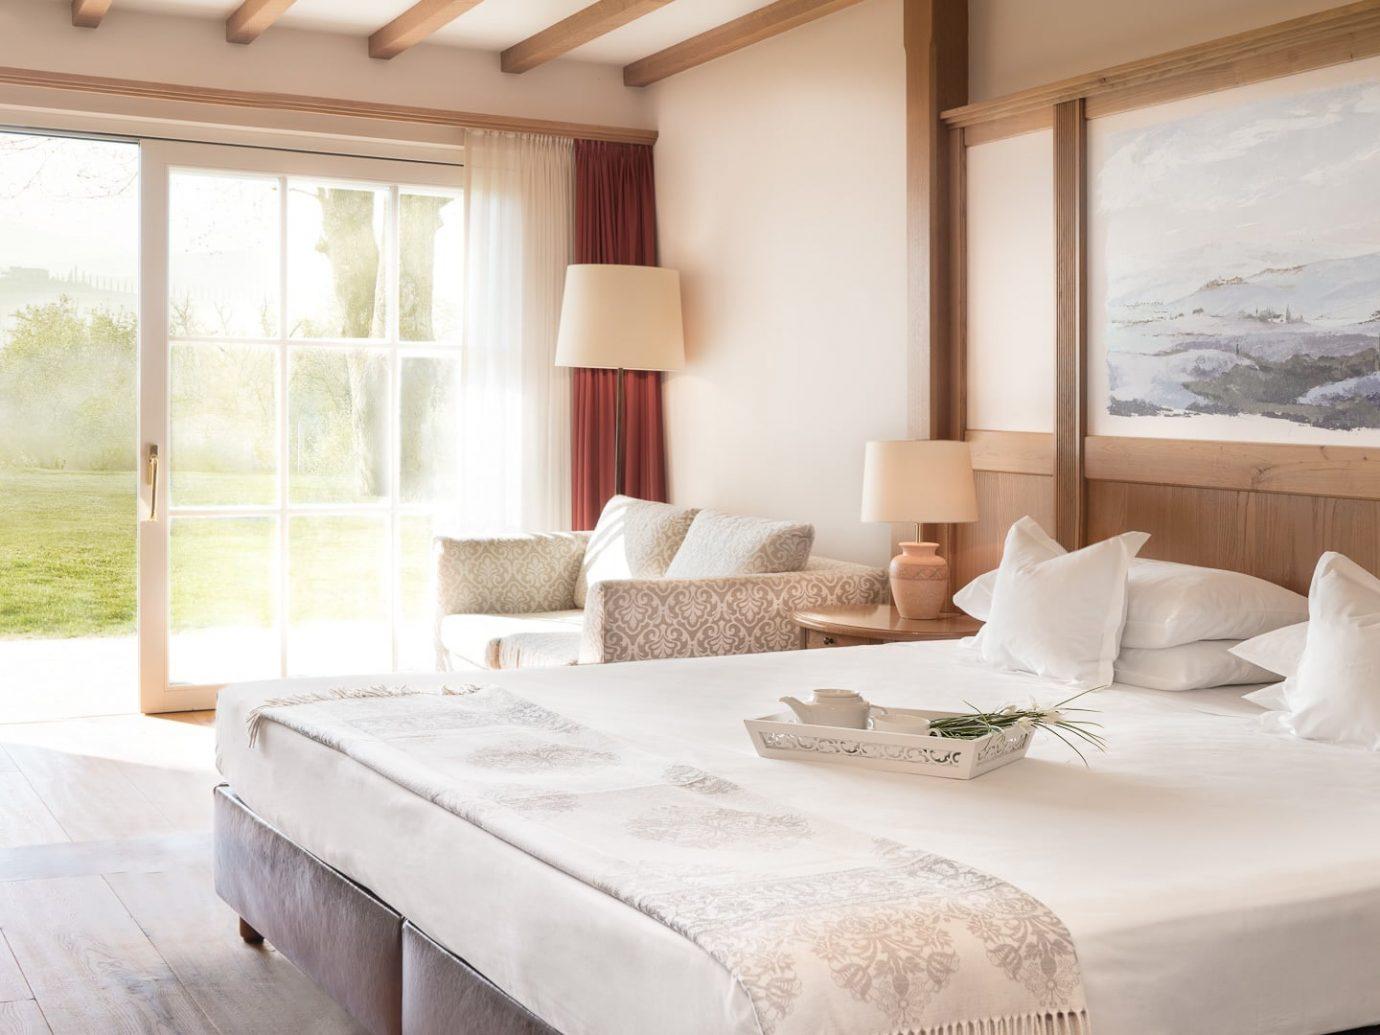 Bedroom at Adler Spa Resort Thermae